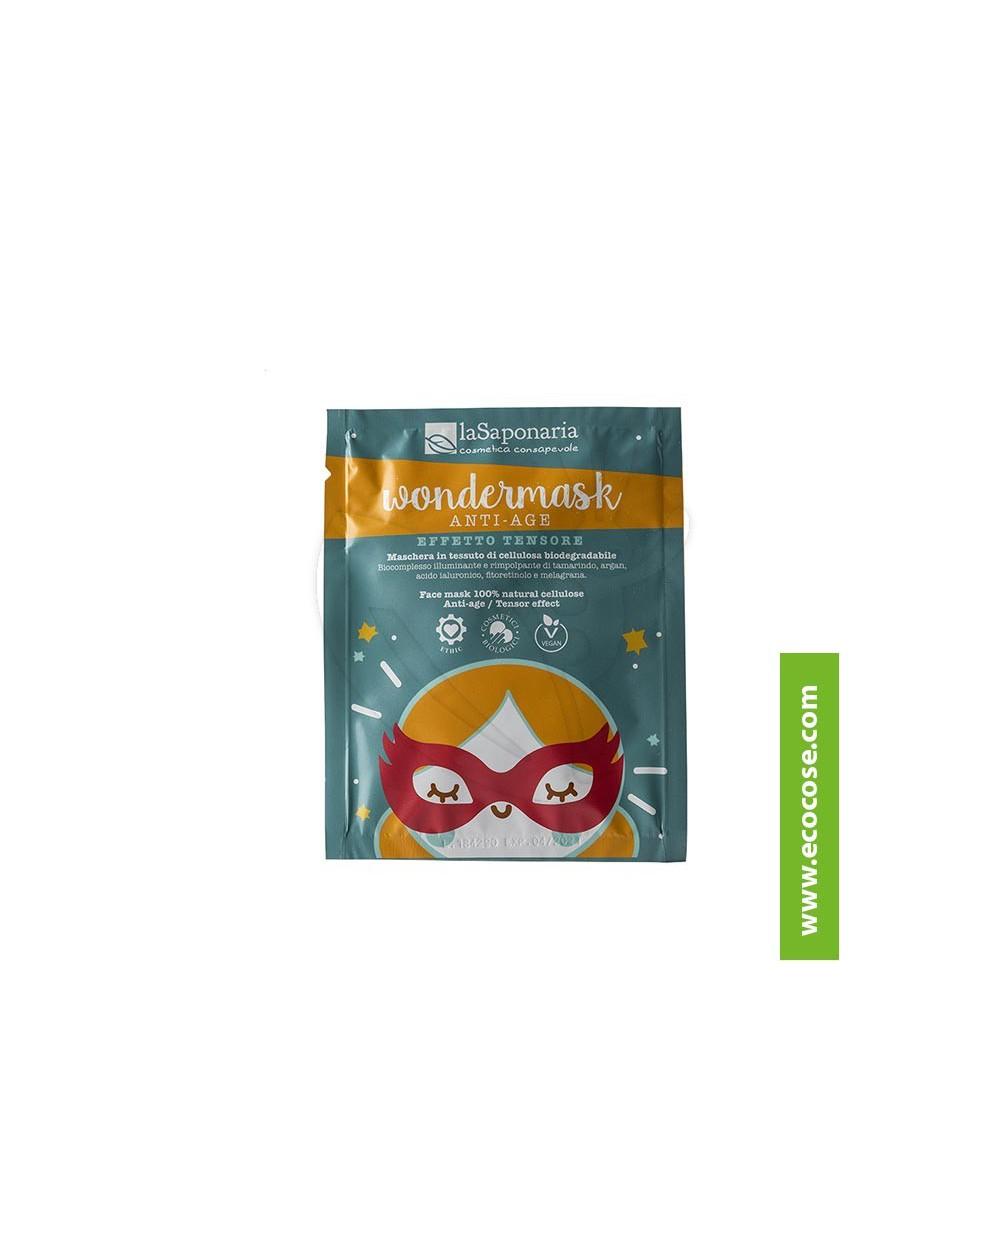 La Saponaria - Wondermask - Maschera in tessuto (biodegradabile) anti-age